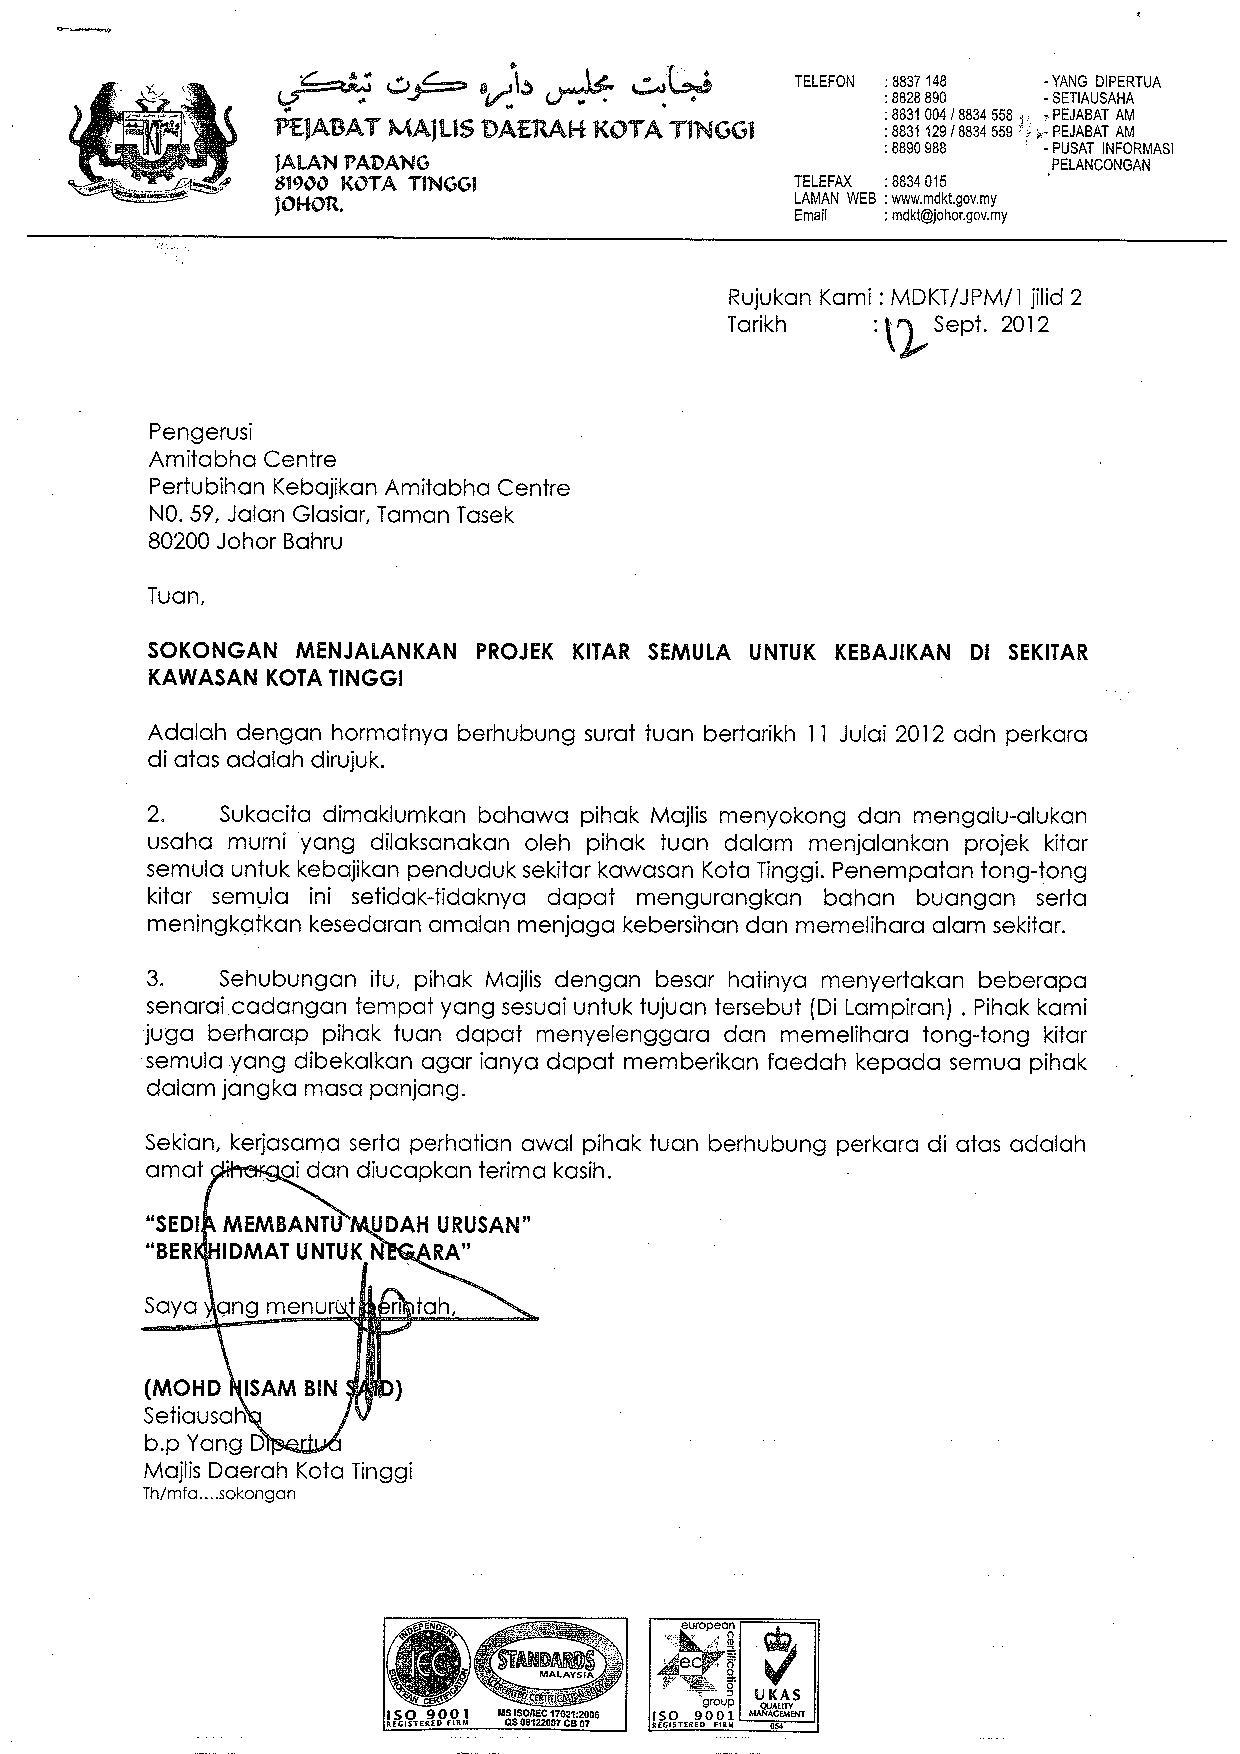 Pmdkt Surat Sokongan Page 001 Amitabha Malaysia